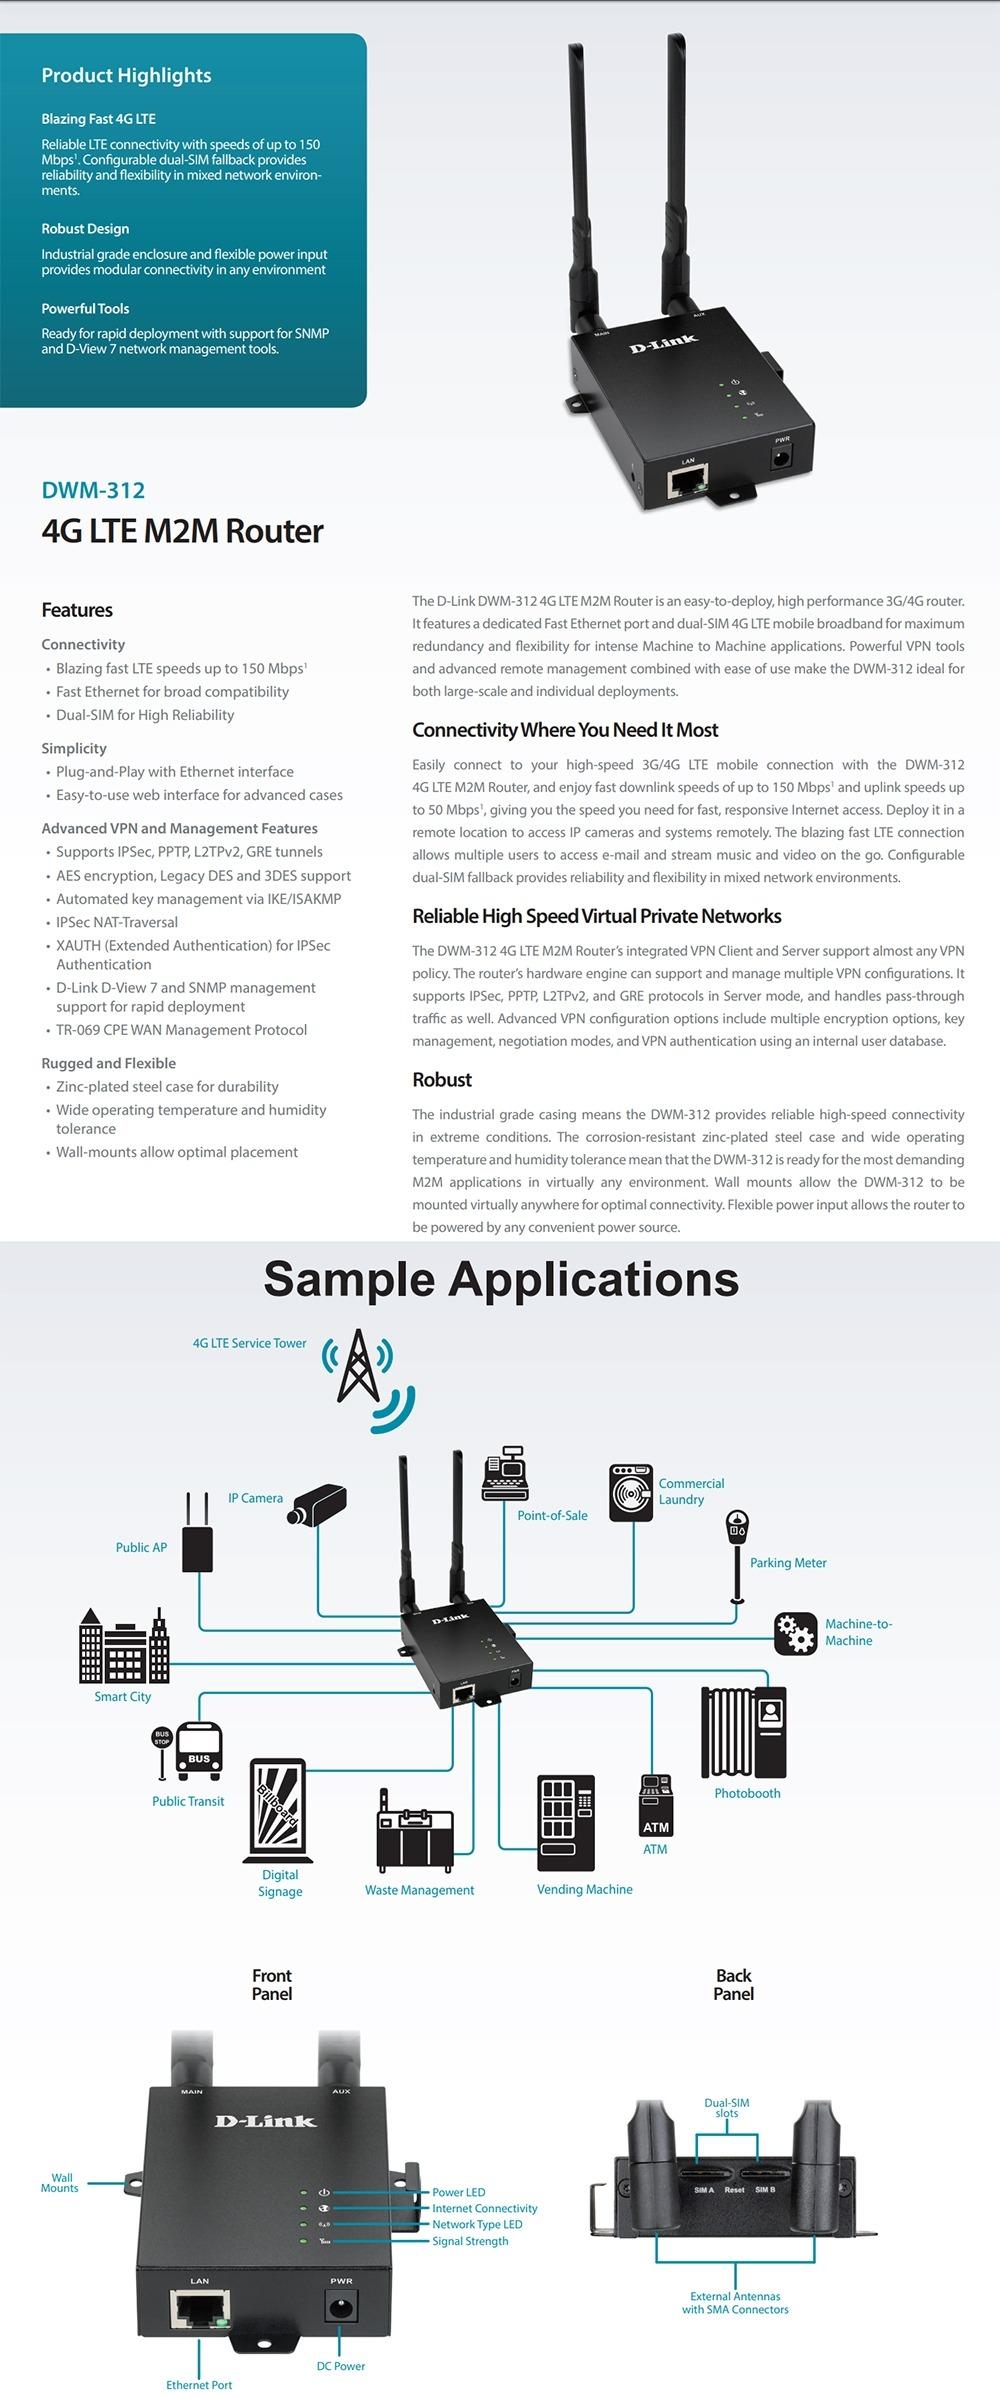 DLINK DWM-312 4G Dual SIM Router with Advanced VPN